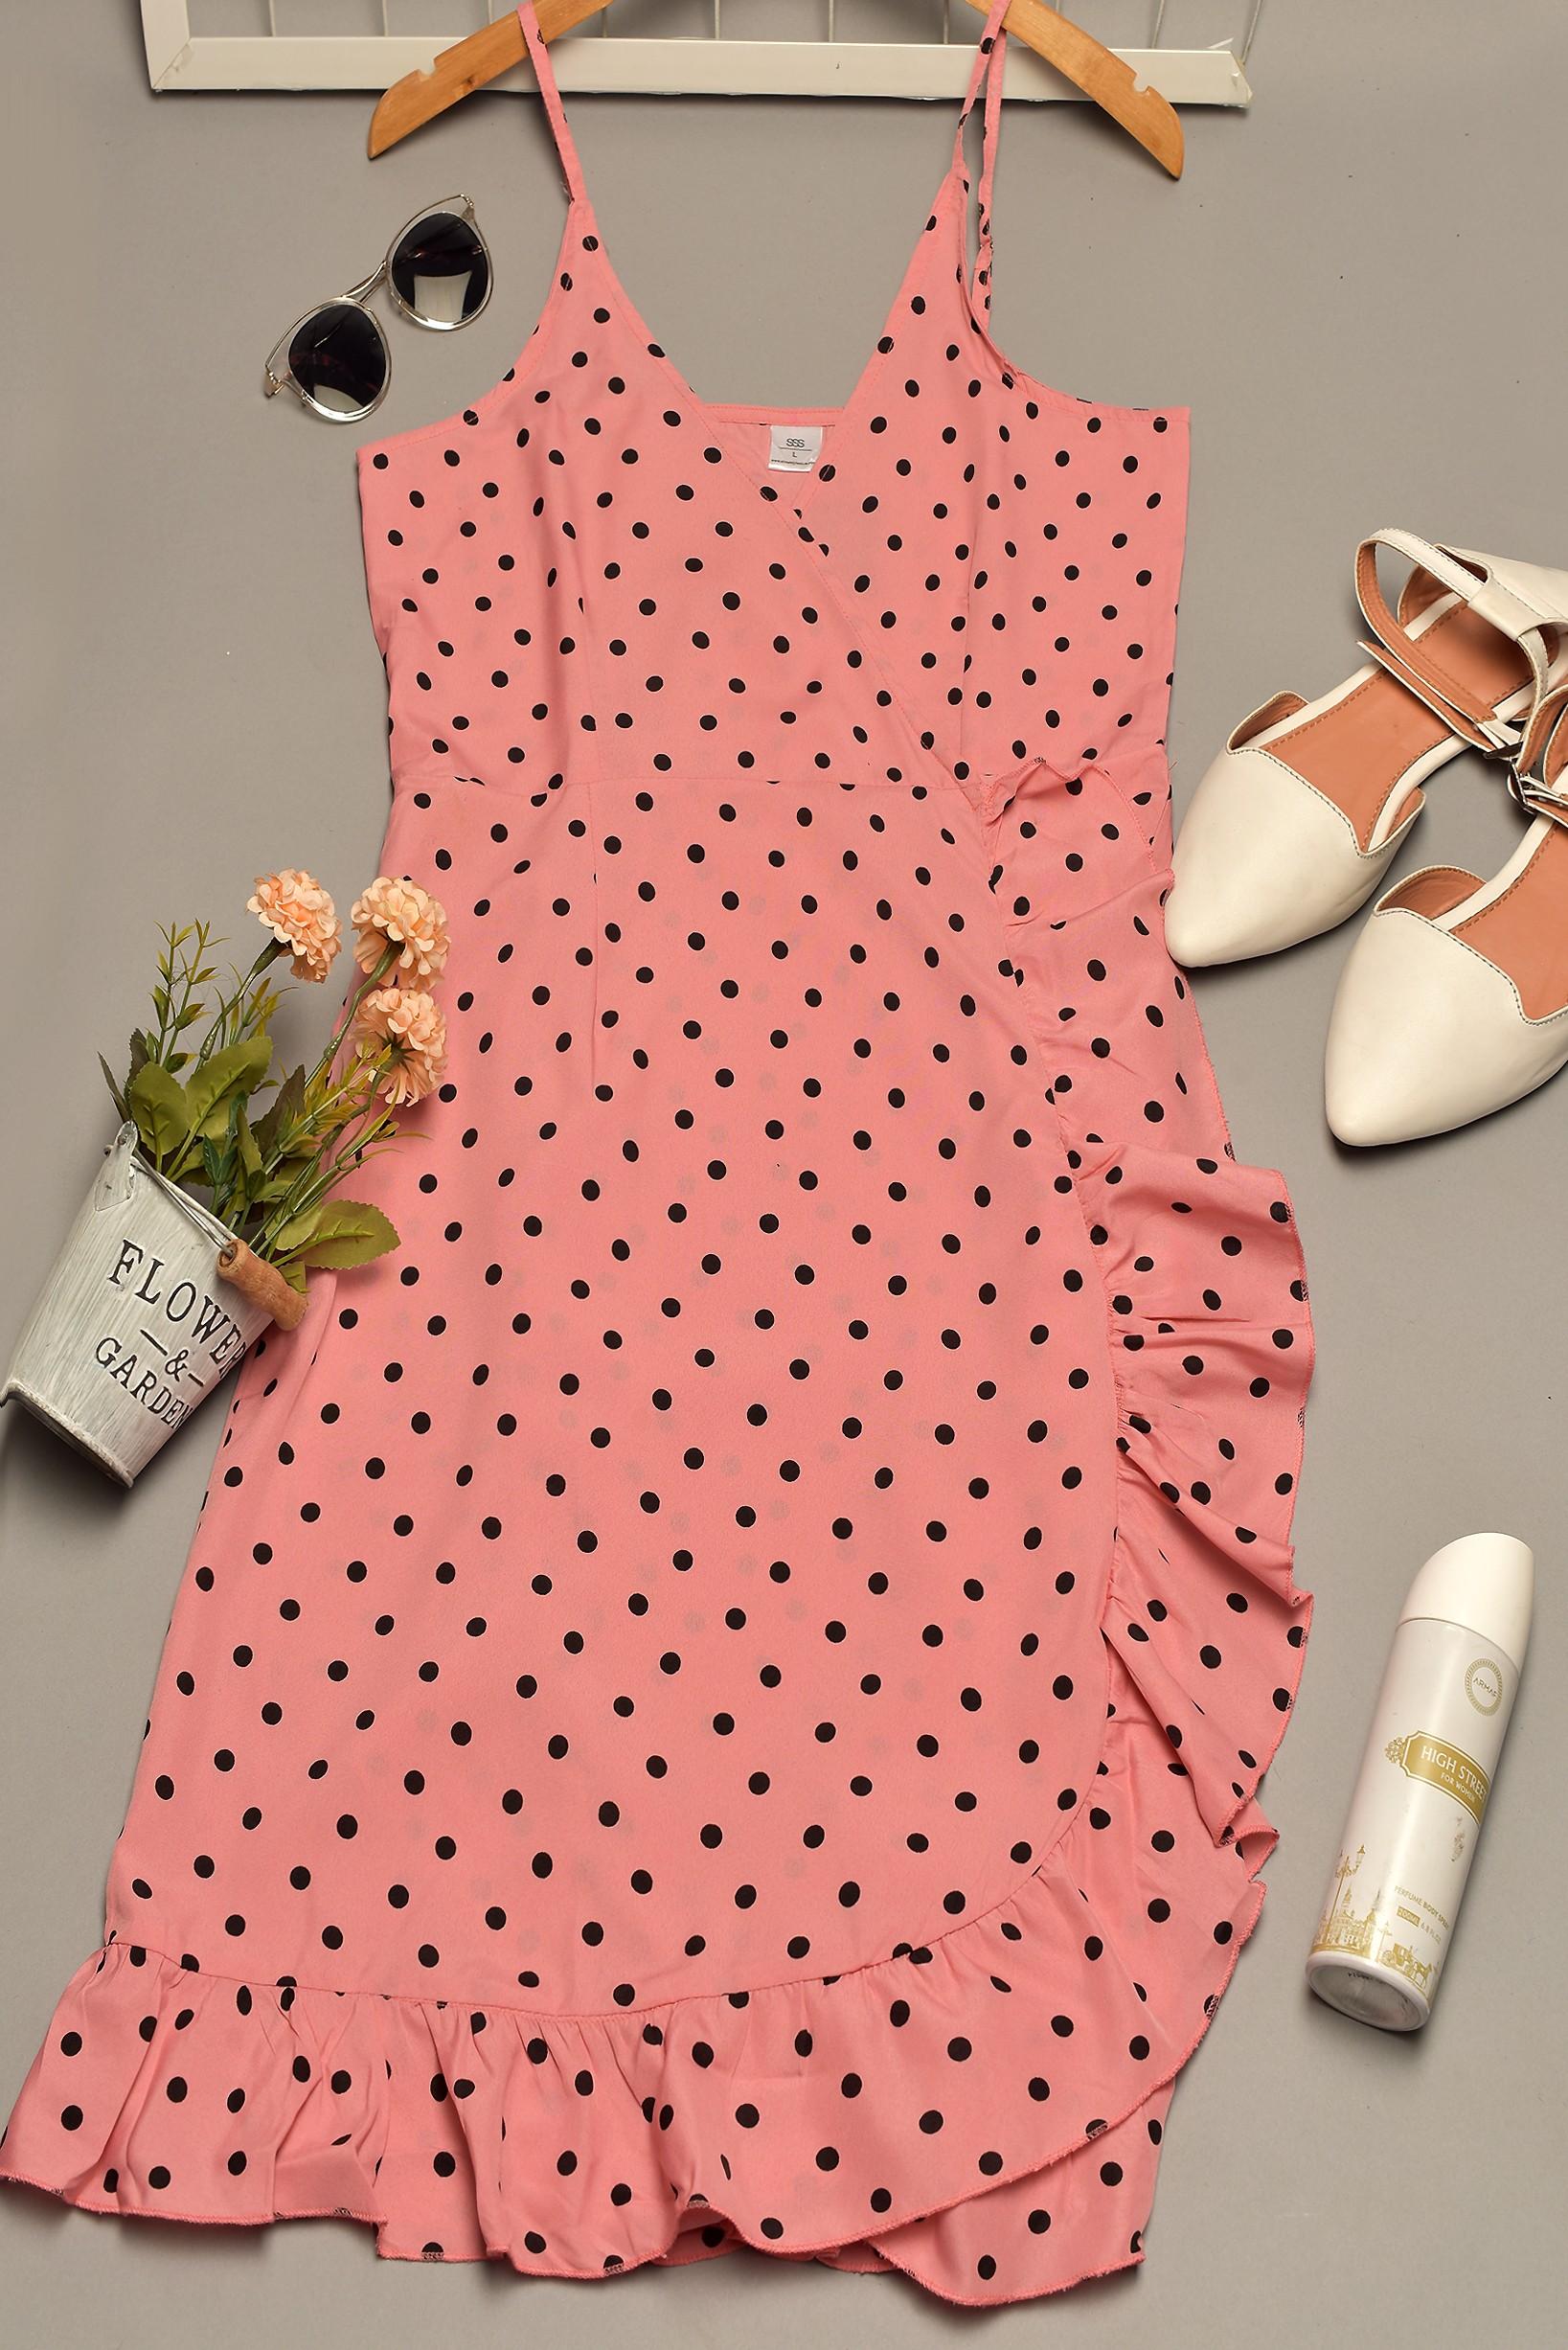 All New Polka Dot Wrap Dress